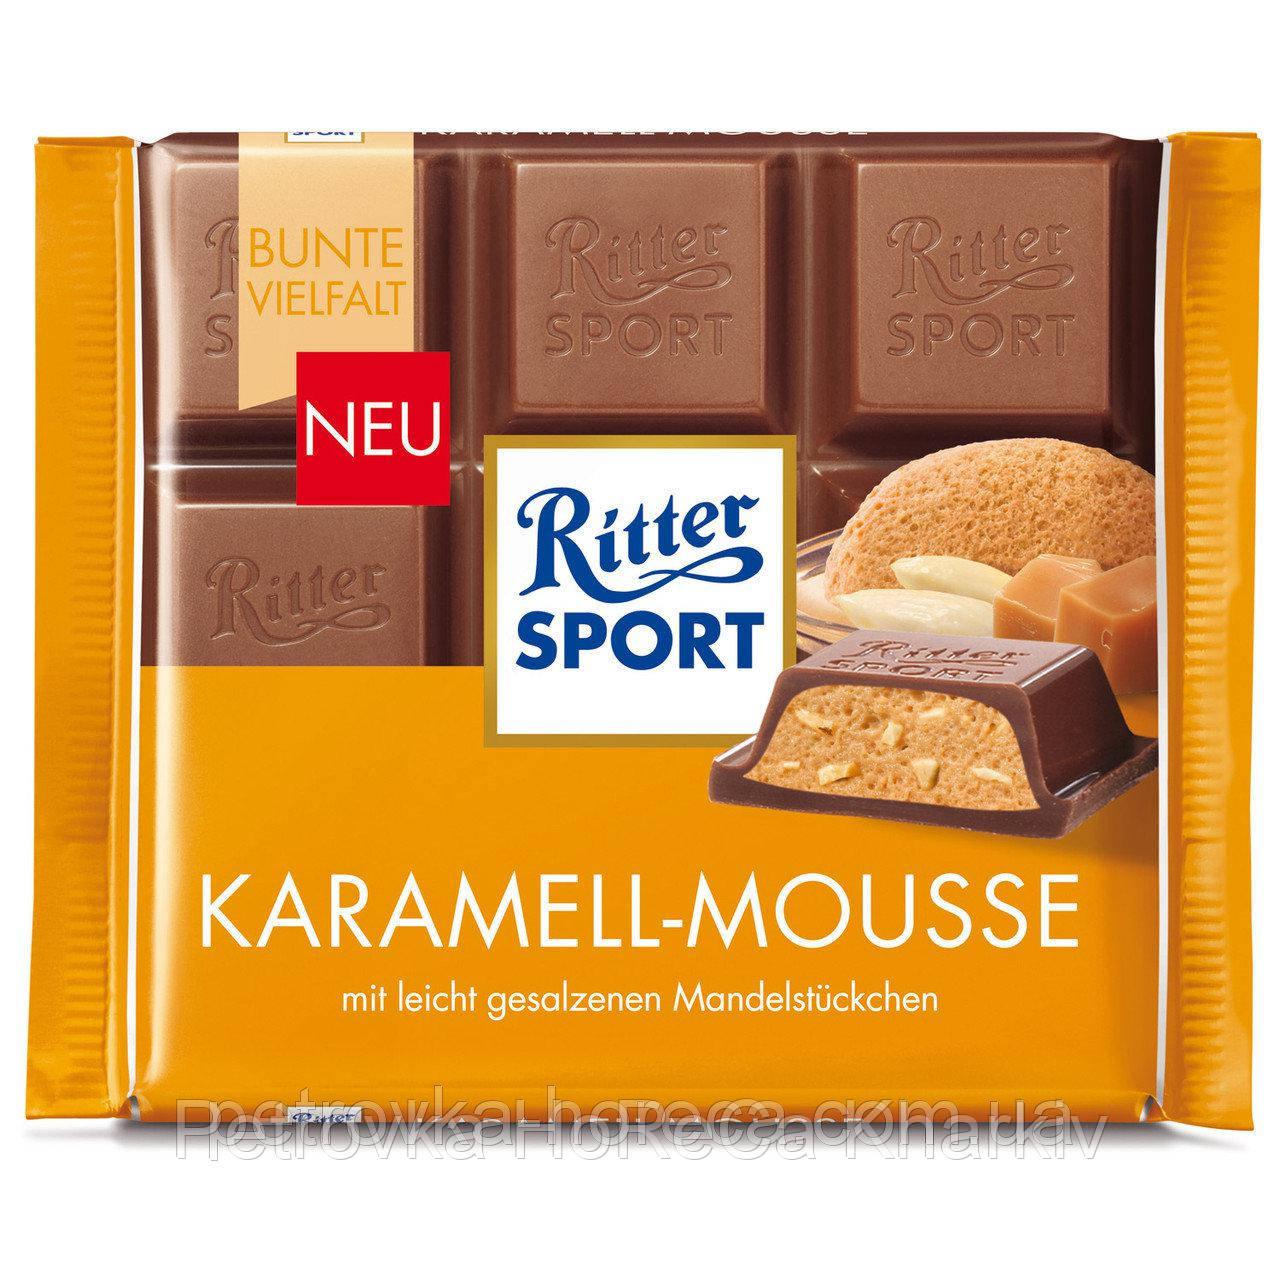 "Шоколад молочный с карамельным муссом ""Ritter Sport"" 100г"